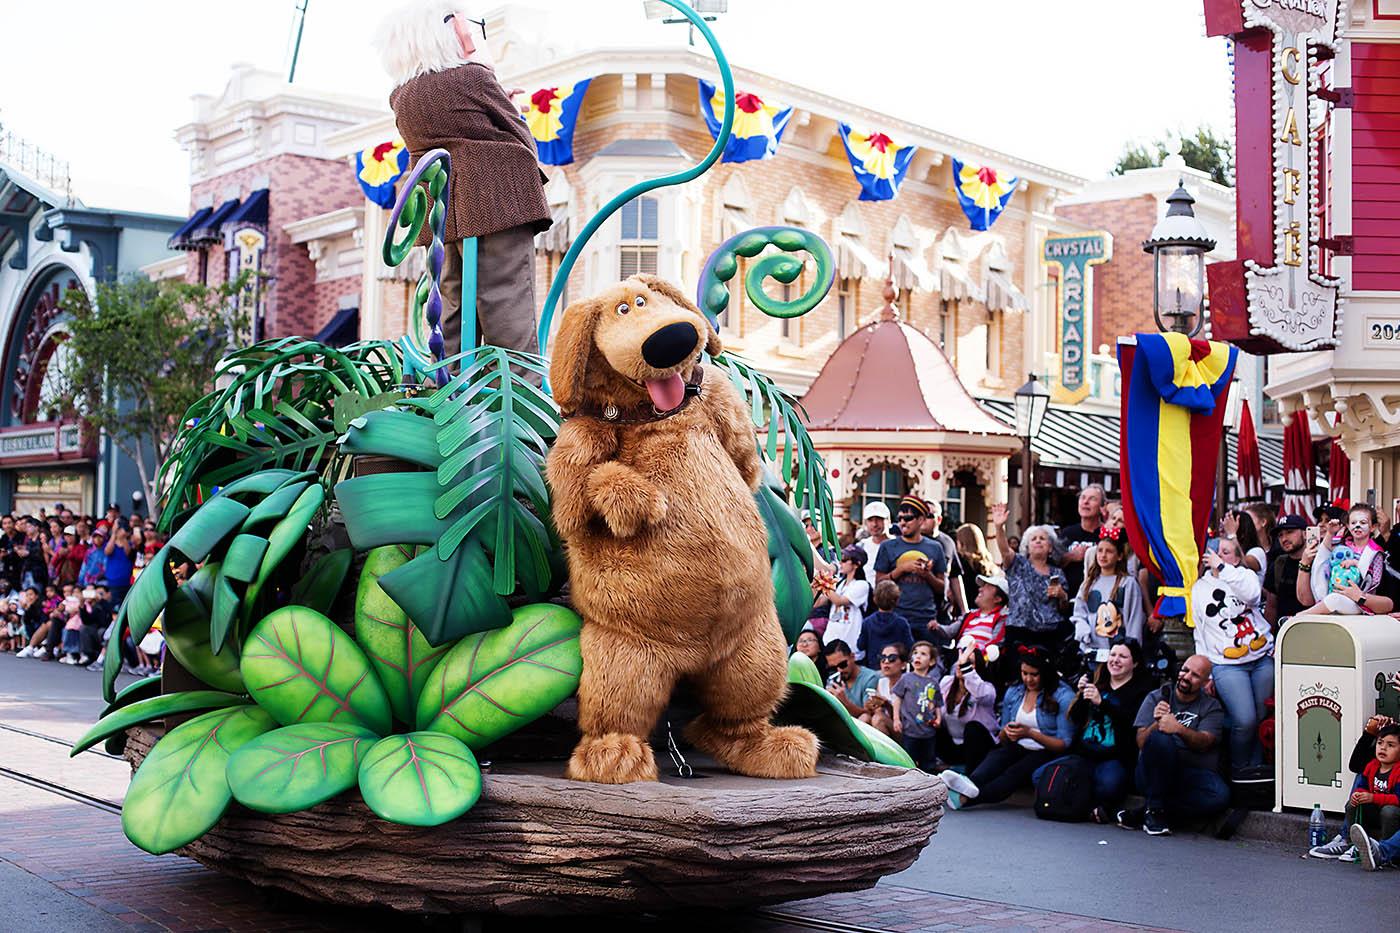 The Ultimate Guide to Pixar Fest at Disneyland and Disney California Adventure